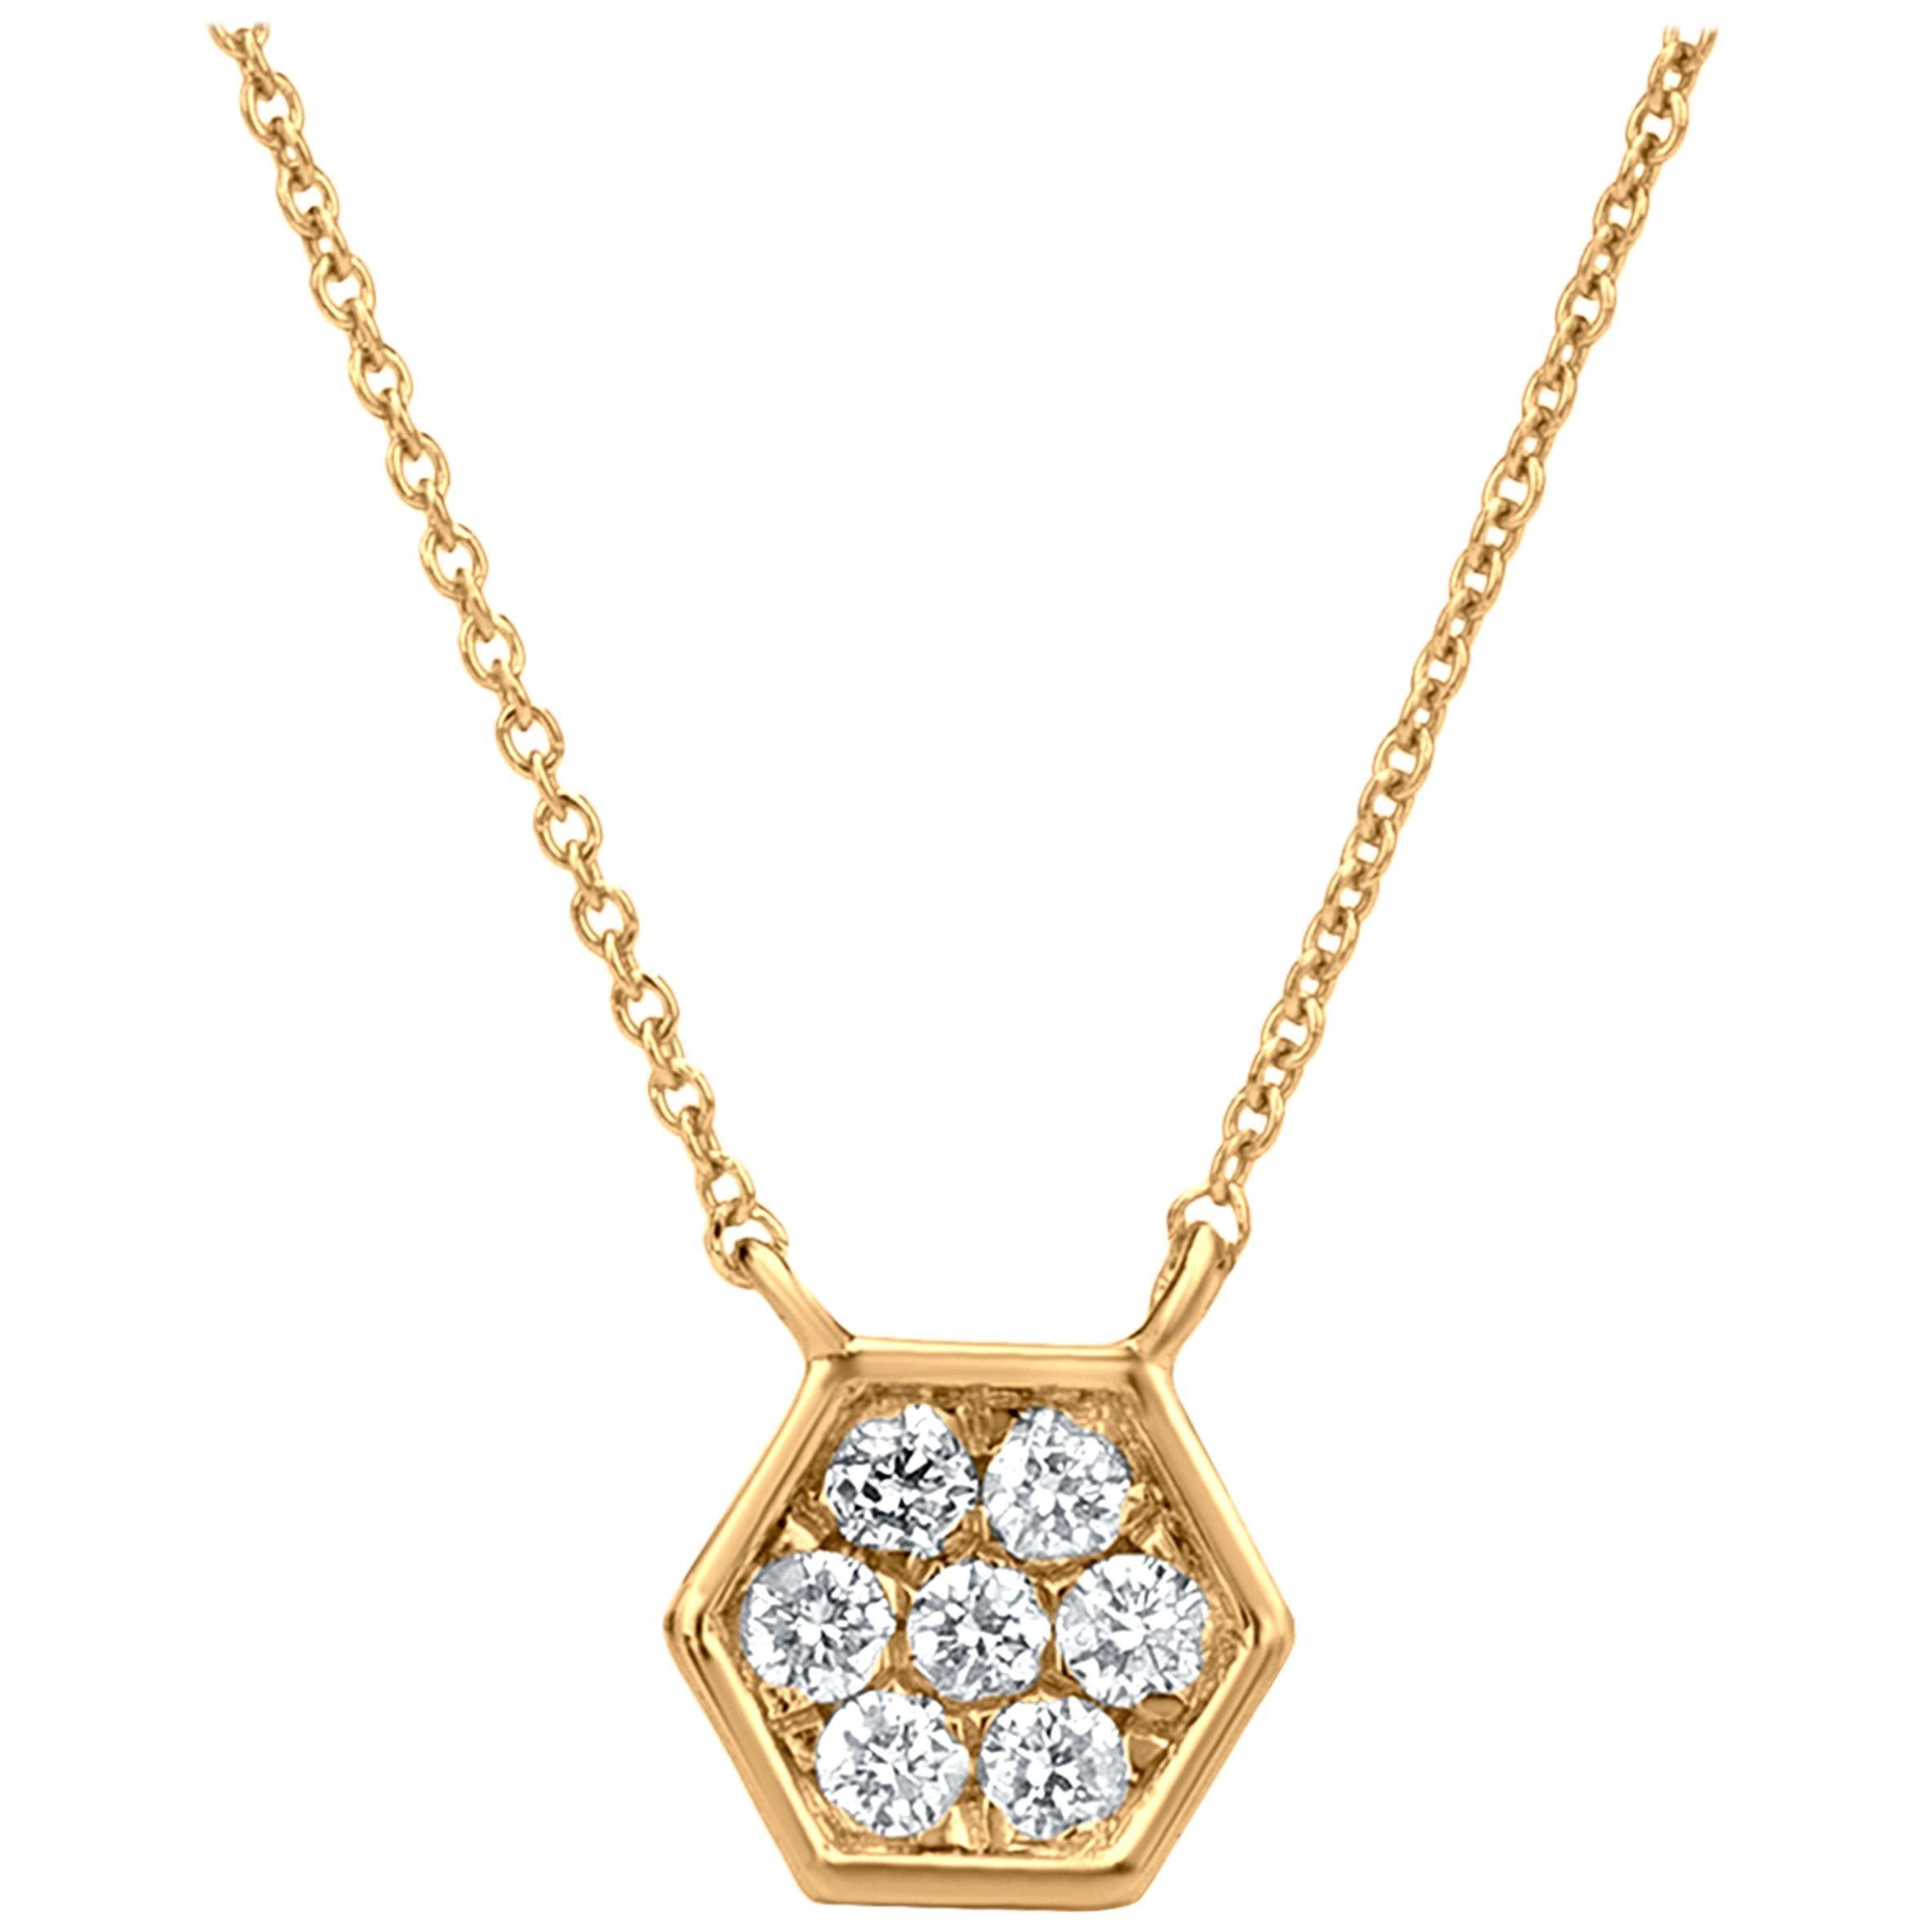 Hexagonal Diamond Pendant Necklace in 18k Yellow Gold